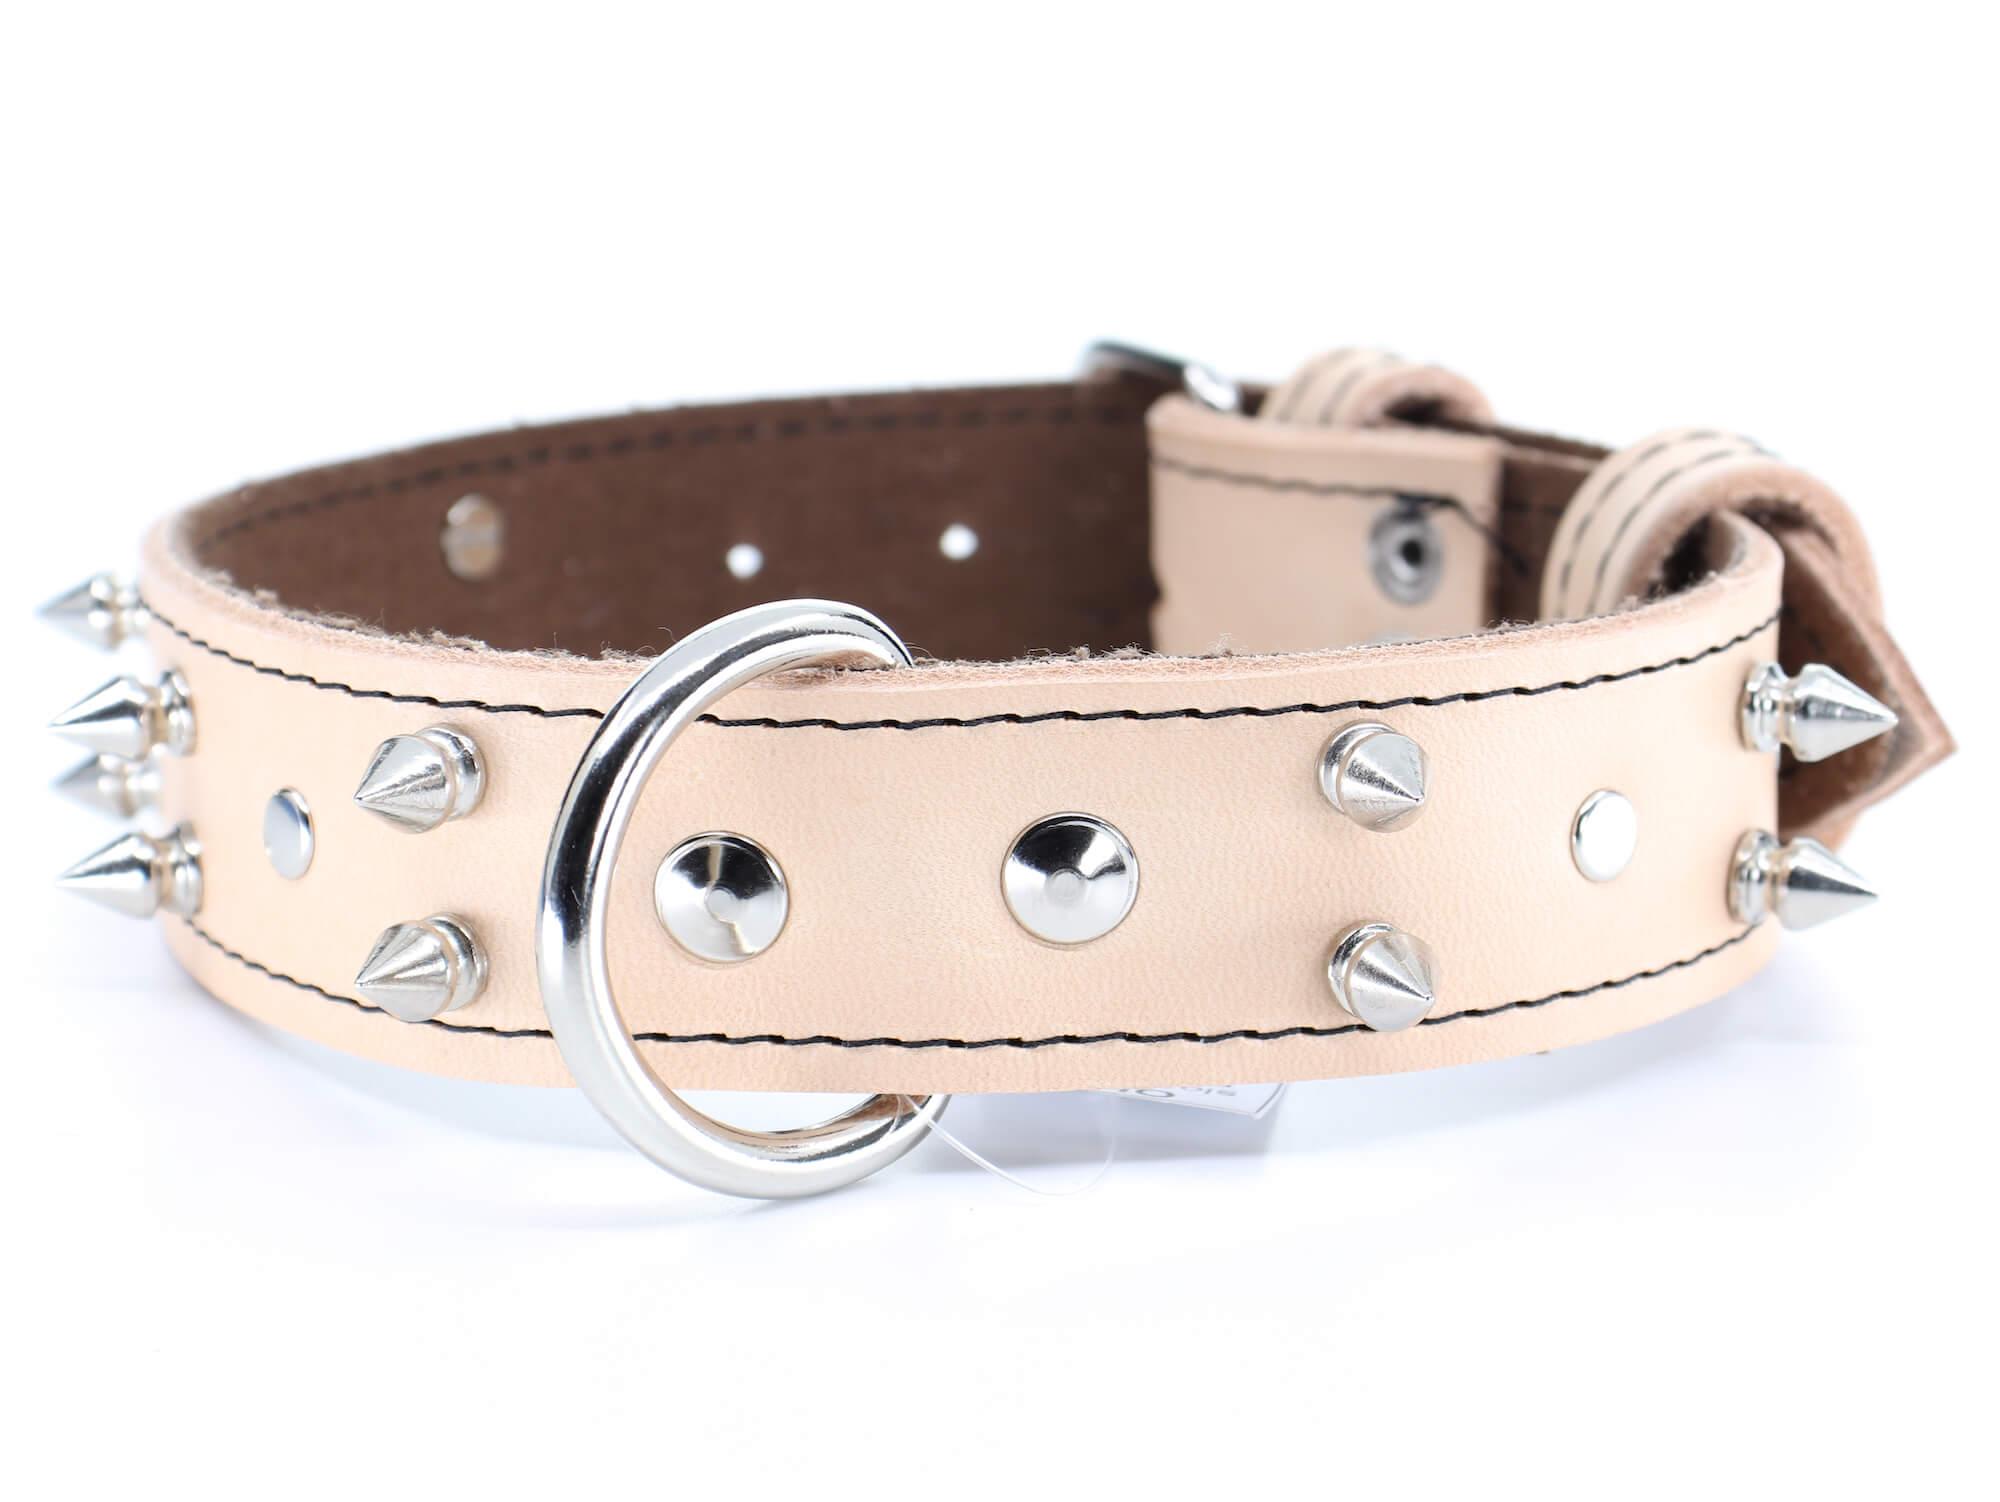 Palkar Apex kožený obojek pro psa s hroty | 22 – 65 cm Barva: Béžová, Obvod krku: 47,5 - 56 cm, Šířka: 2,5 cm